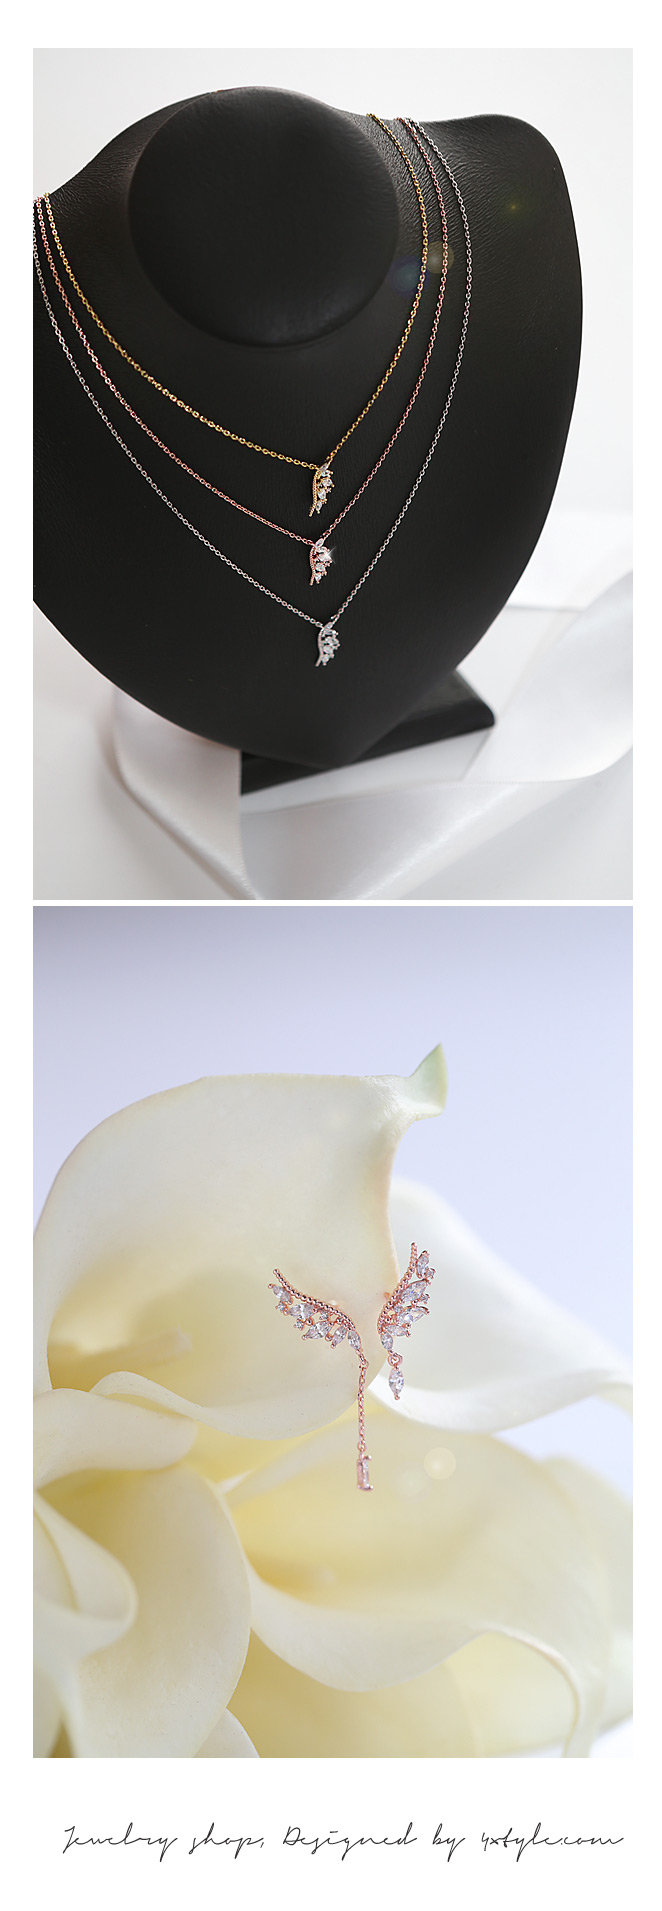 [ 4xtyle ] [银] AVIEN 翼集(WHITEGOLD)